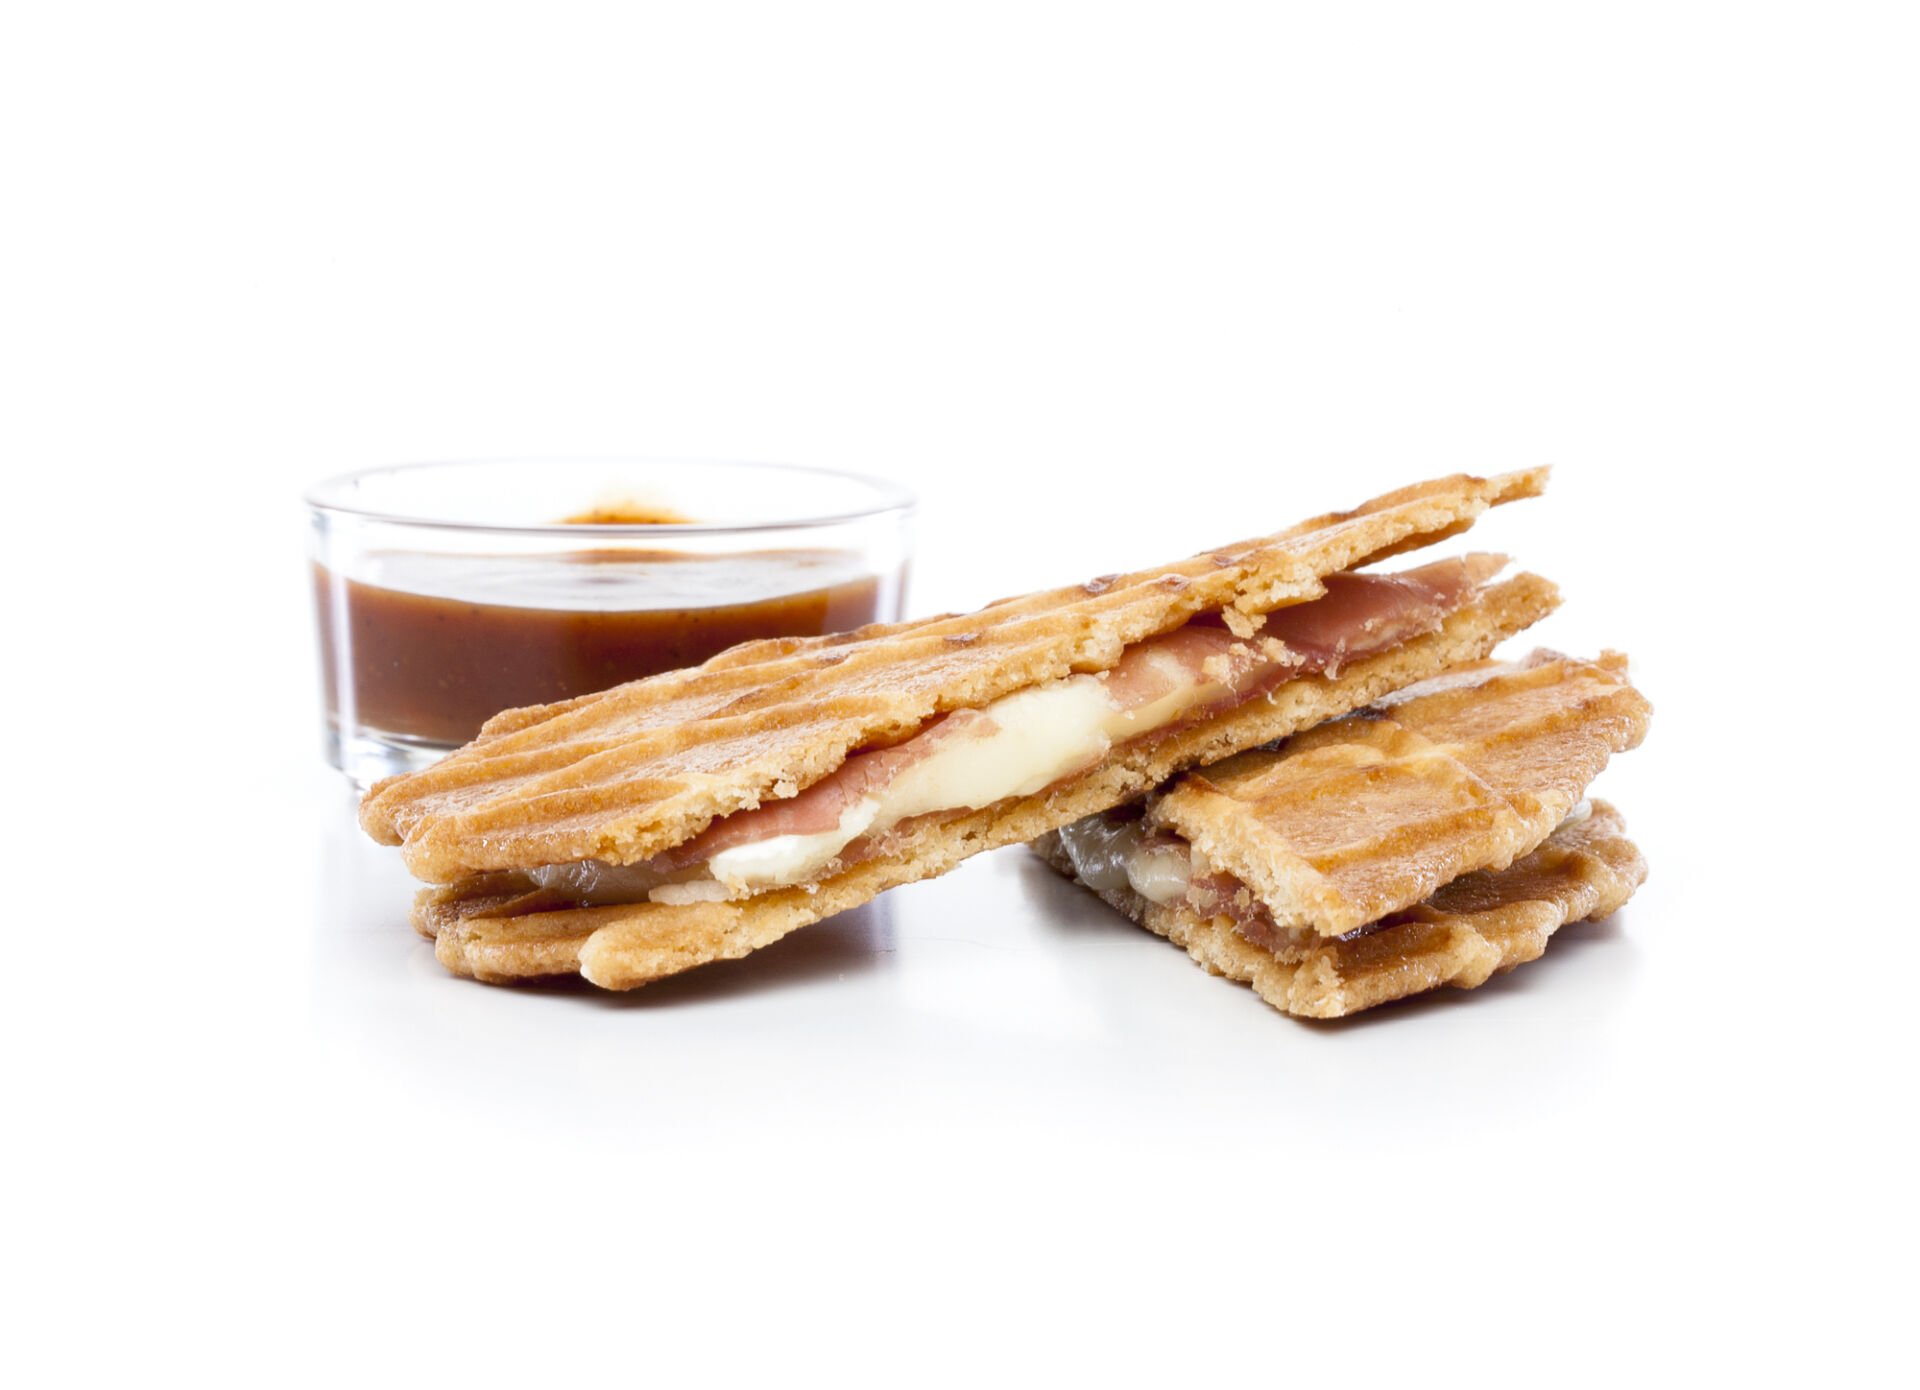 Croque galette au beurre jambon ganda brie